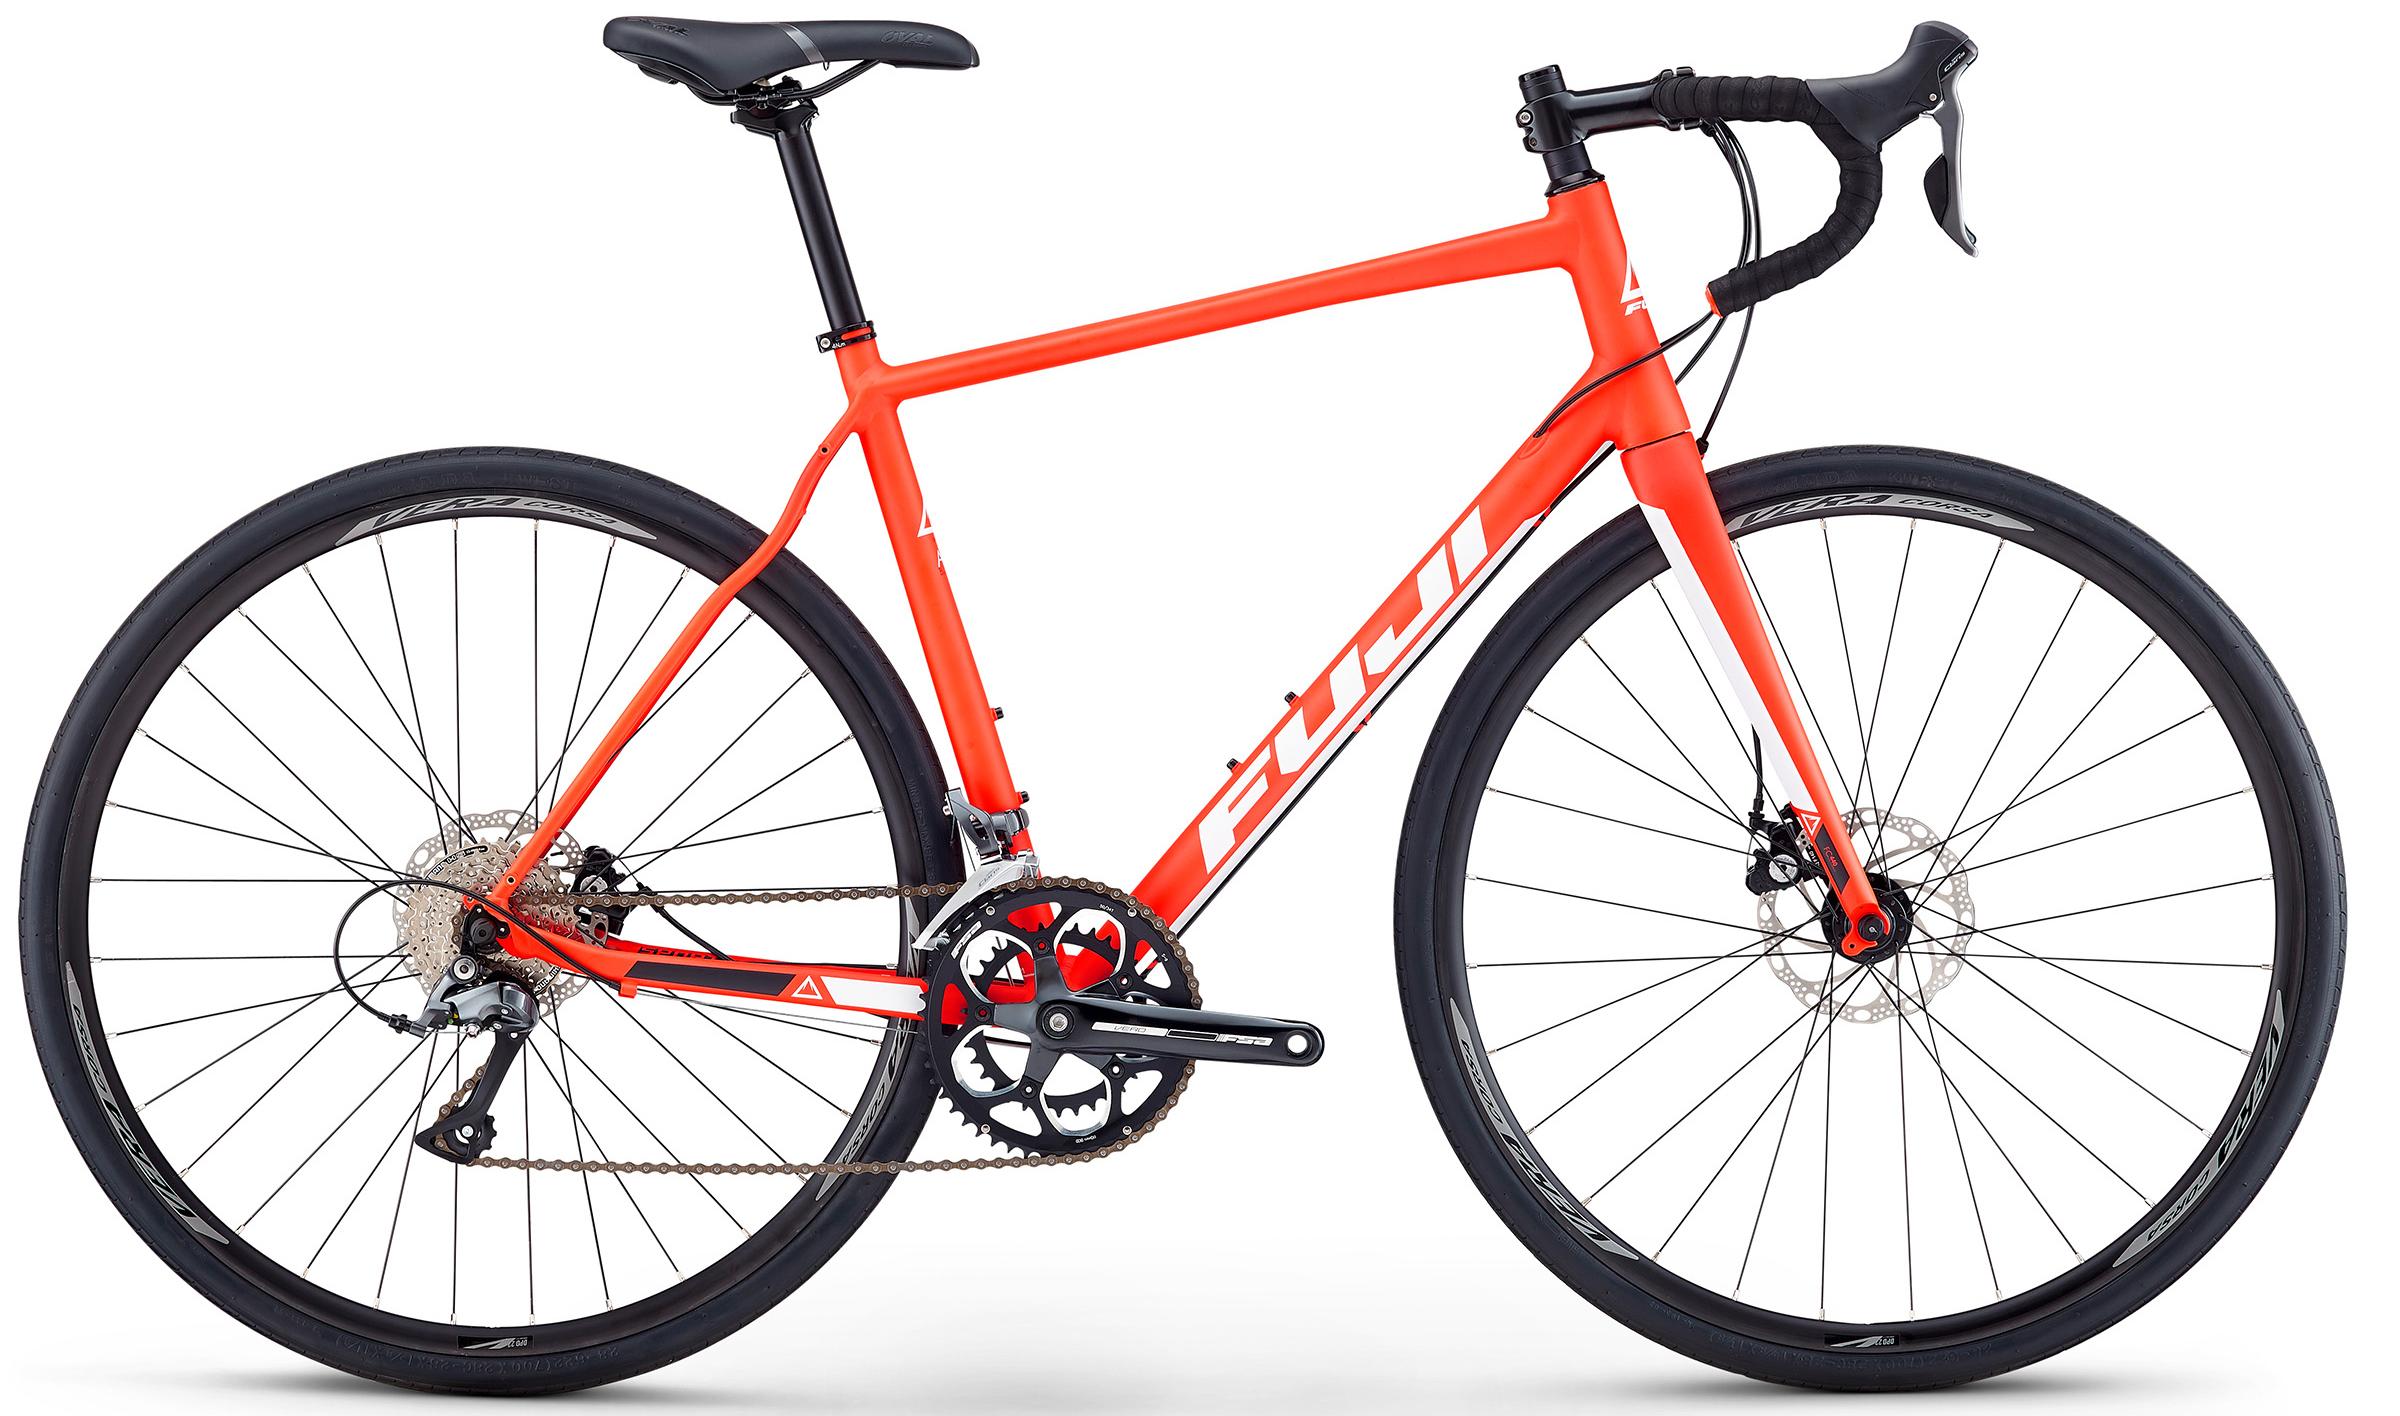 Best Budget Road Bikes Under $1,000 | GearJunkie